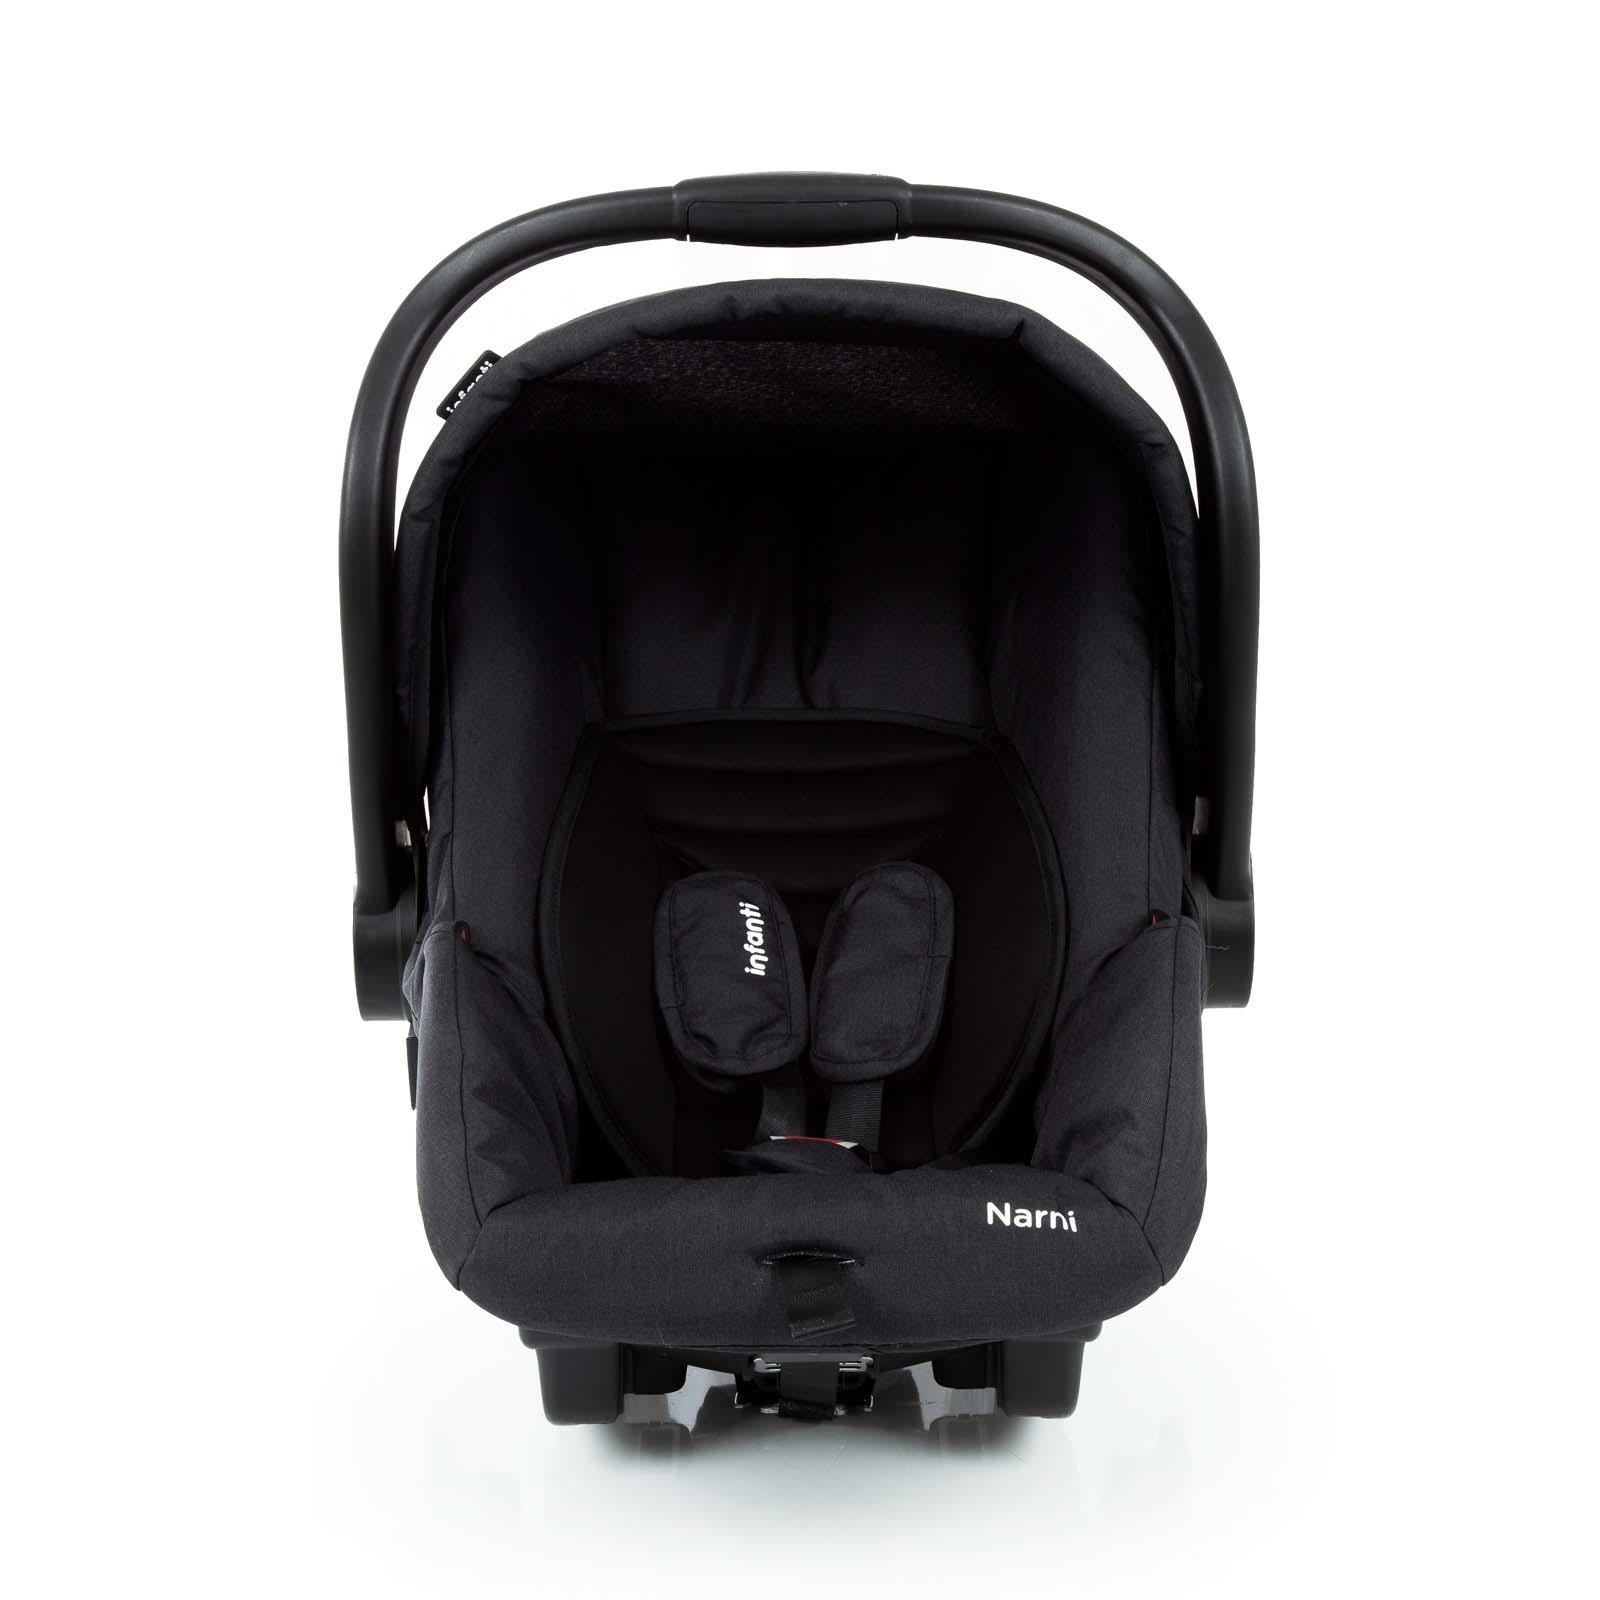 Carrinho Travel System Infanti Collina com Bebê Conforto - Black Style